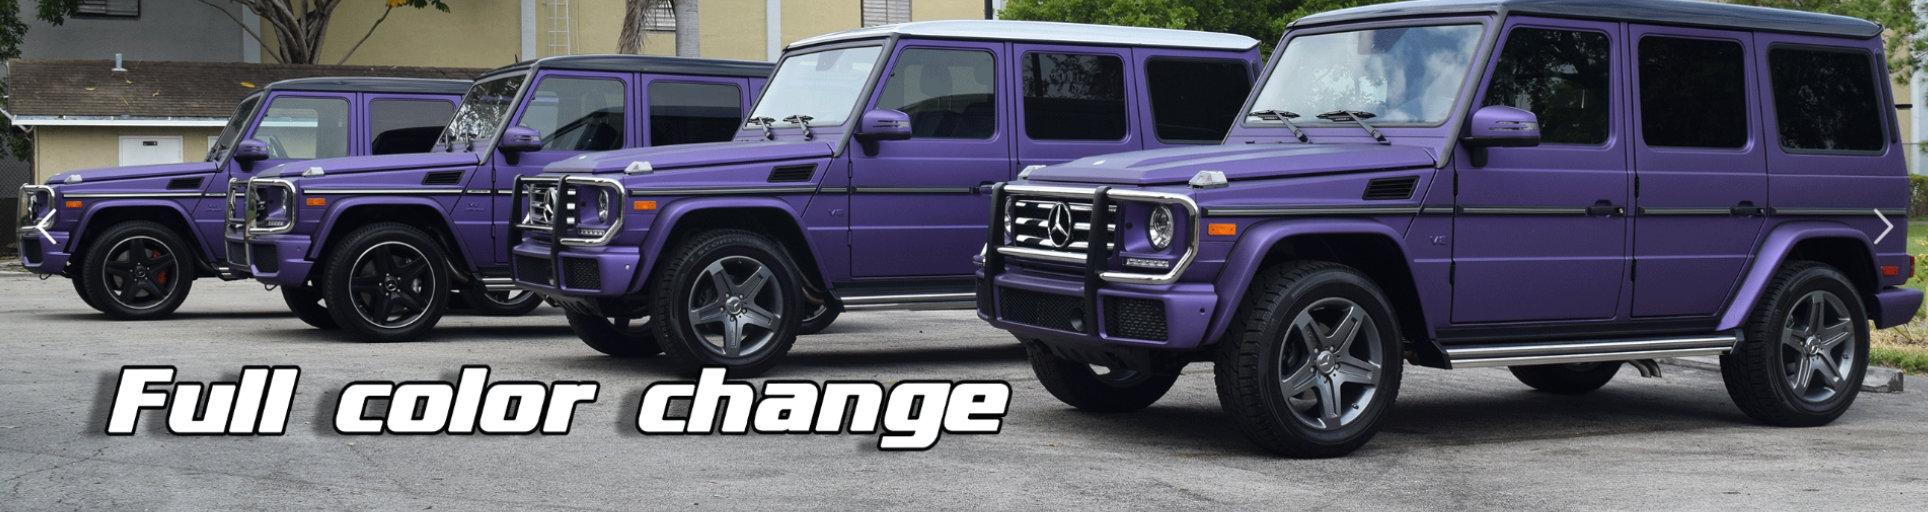 purple Mercedes-Benz cars